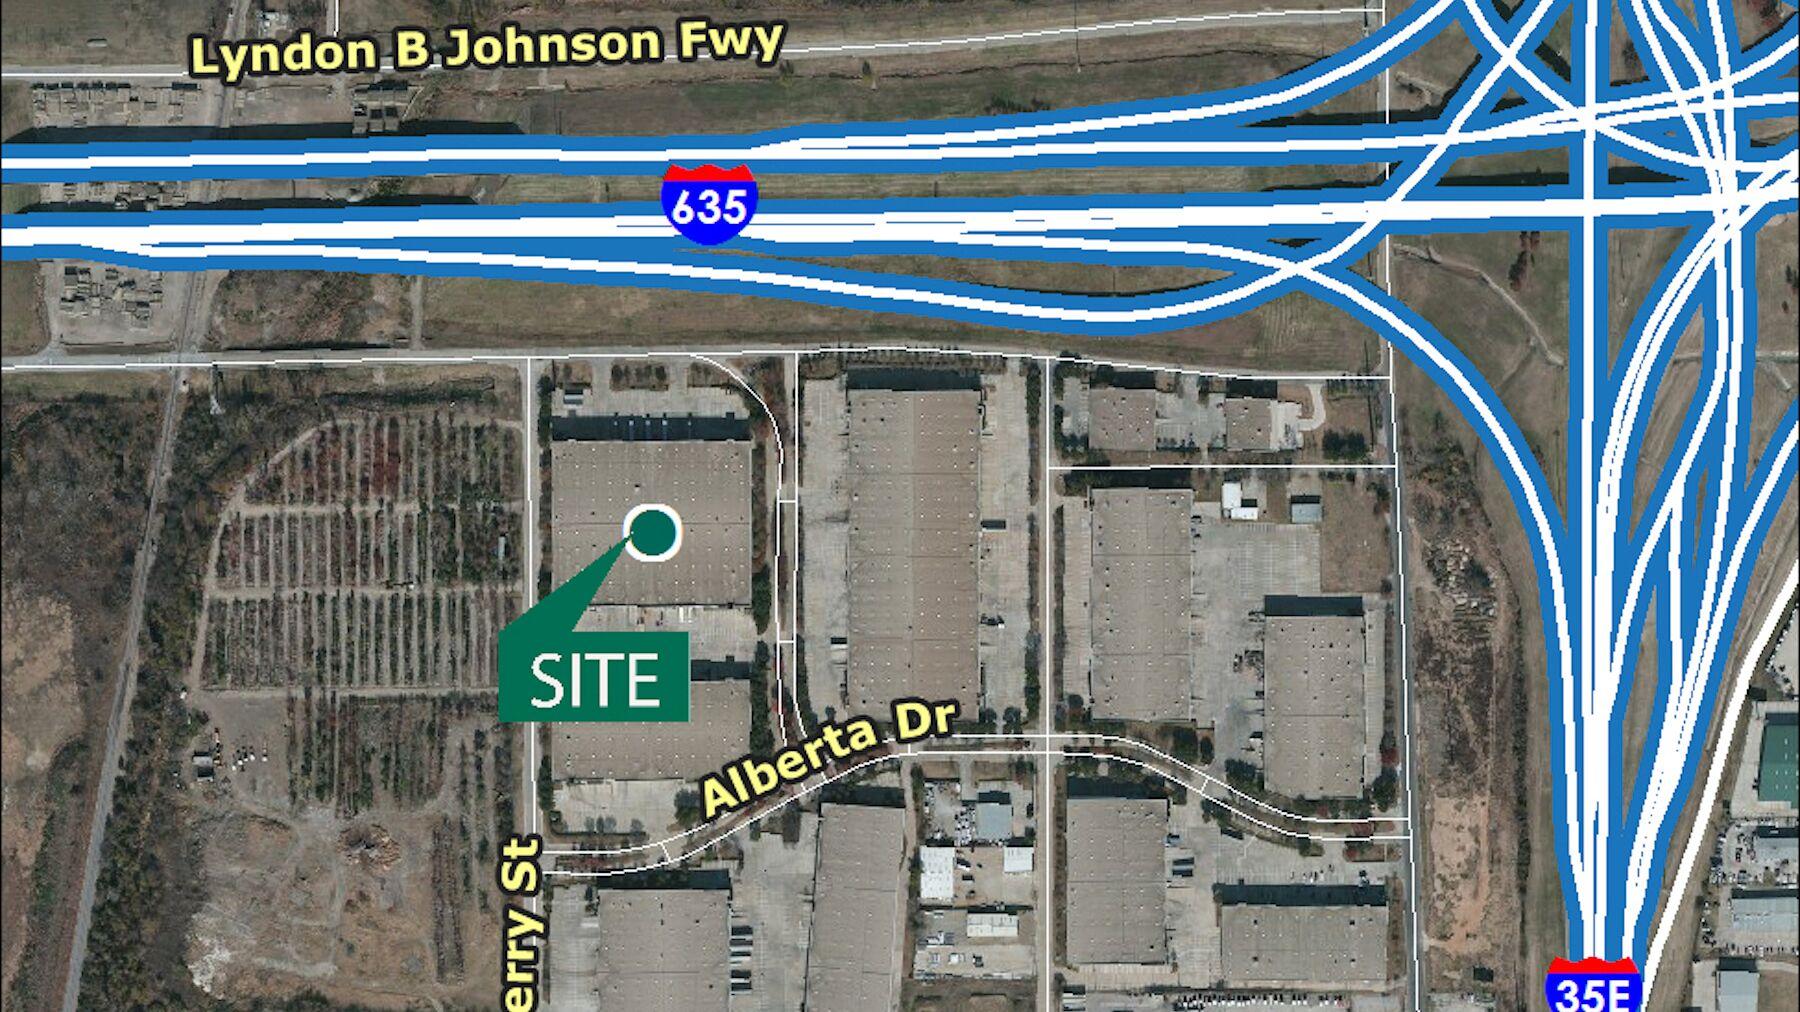 DPM-Prologis-Dallas-Corporate-Center-1-DAL00101-2230-LBJ-Freeway_AerialMap.jpg